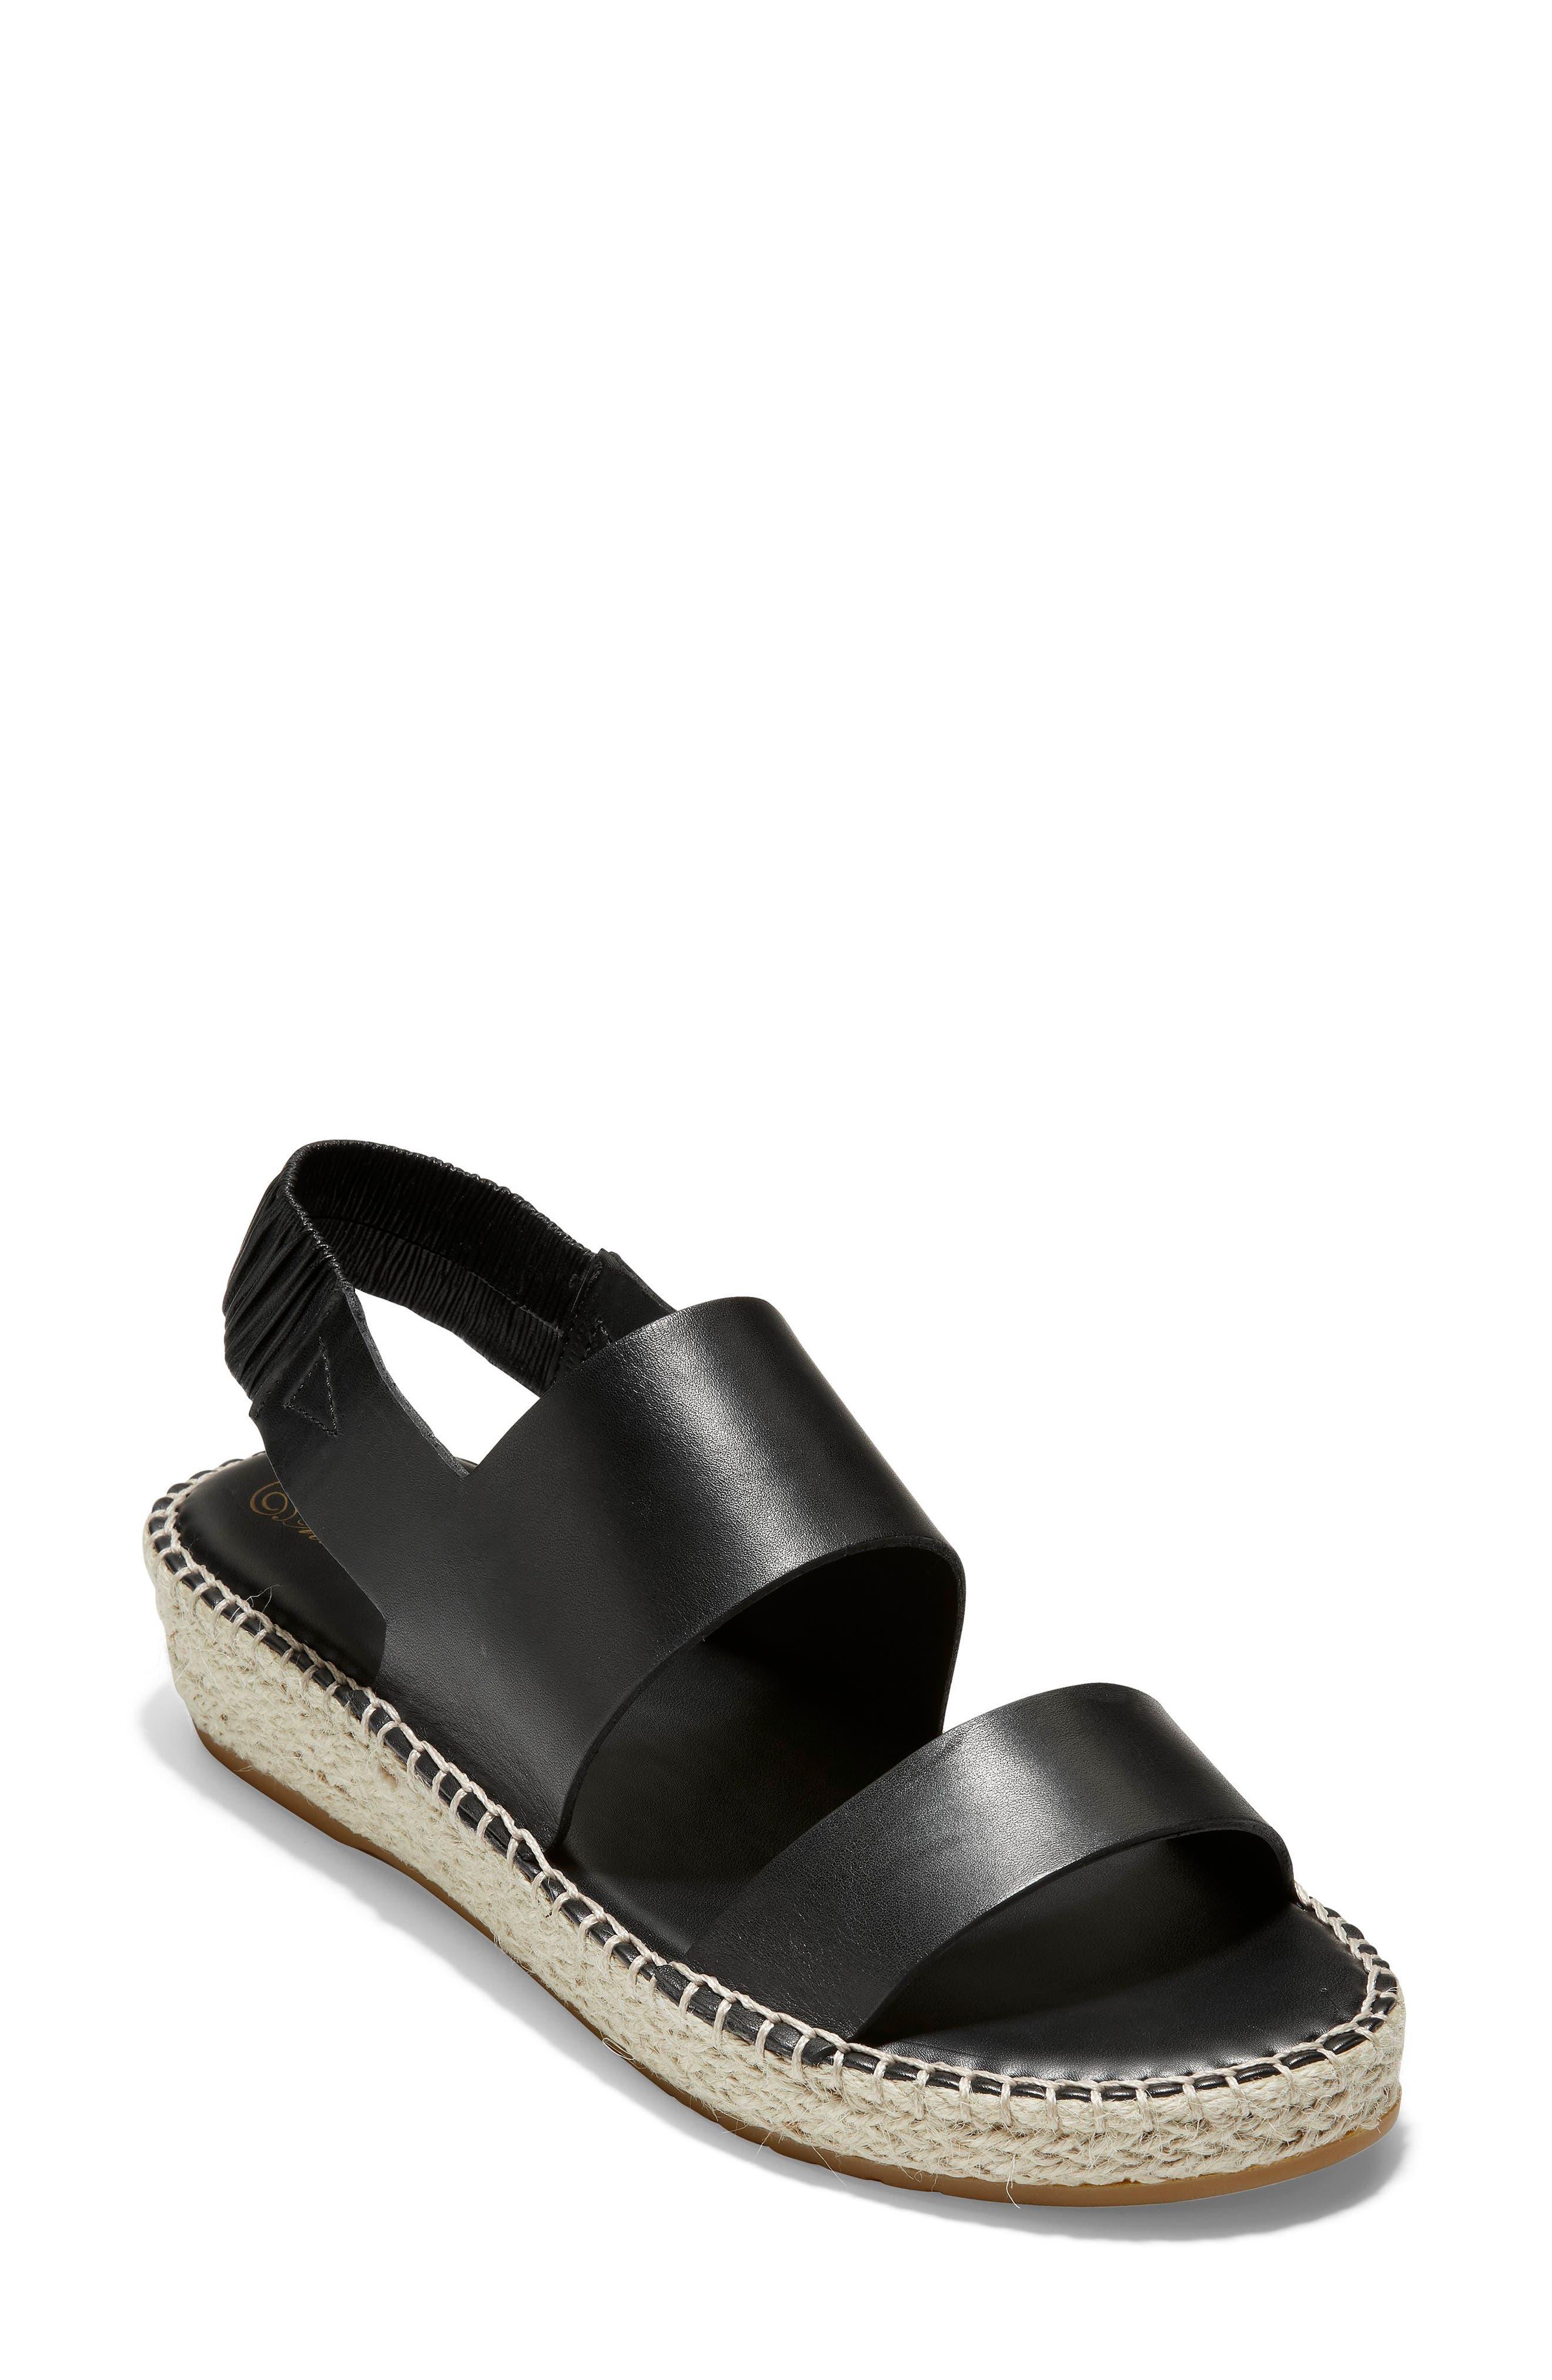 Cloudfeel Espadrille Sandal, Main, color, BLACK LEATHER